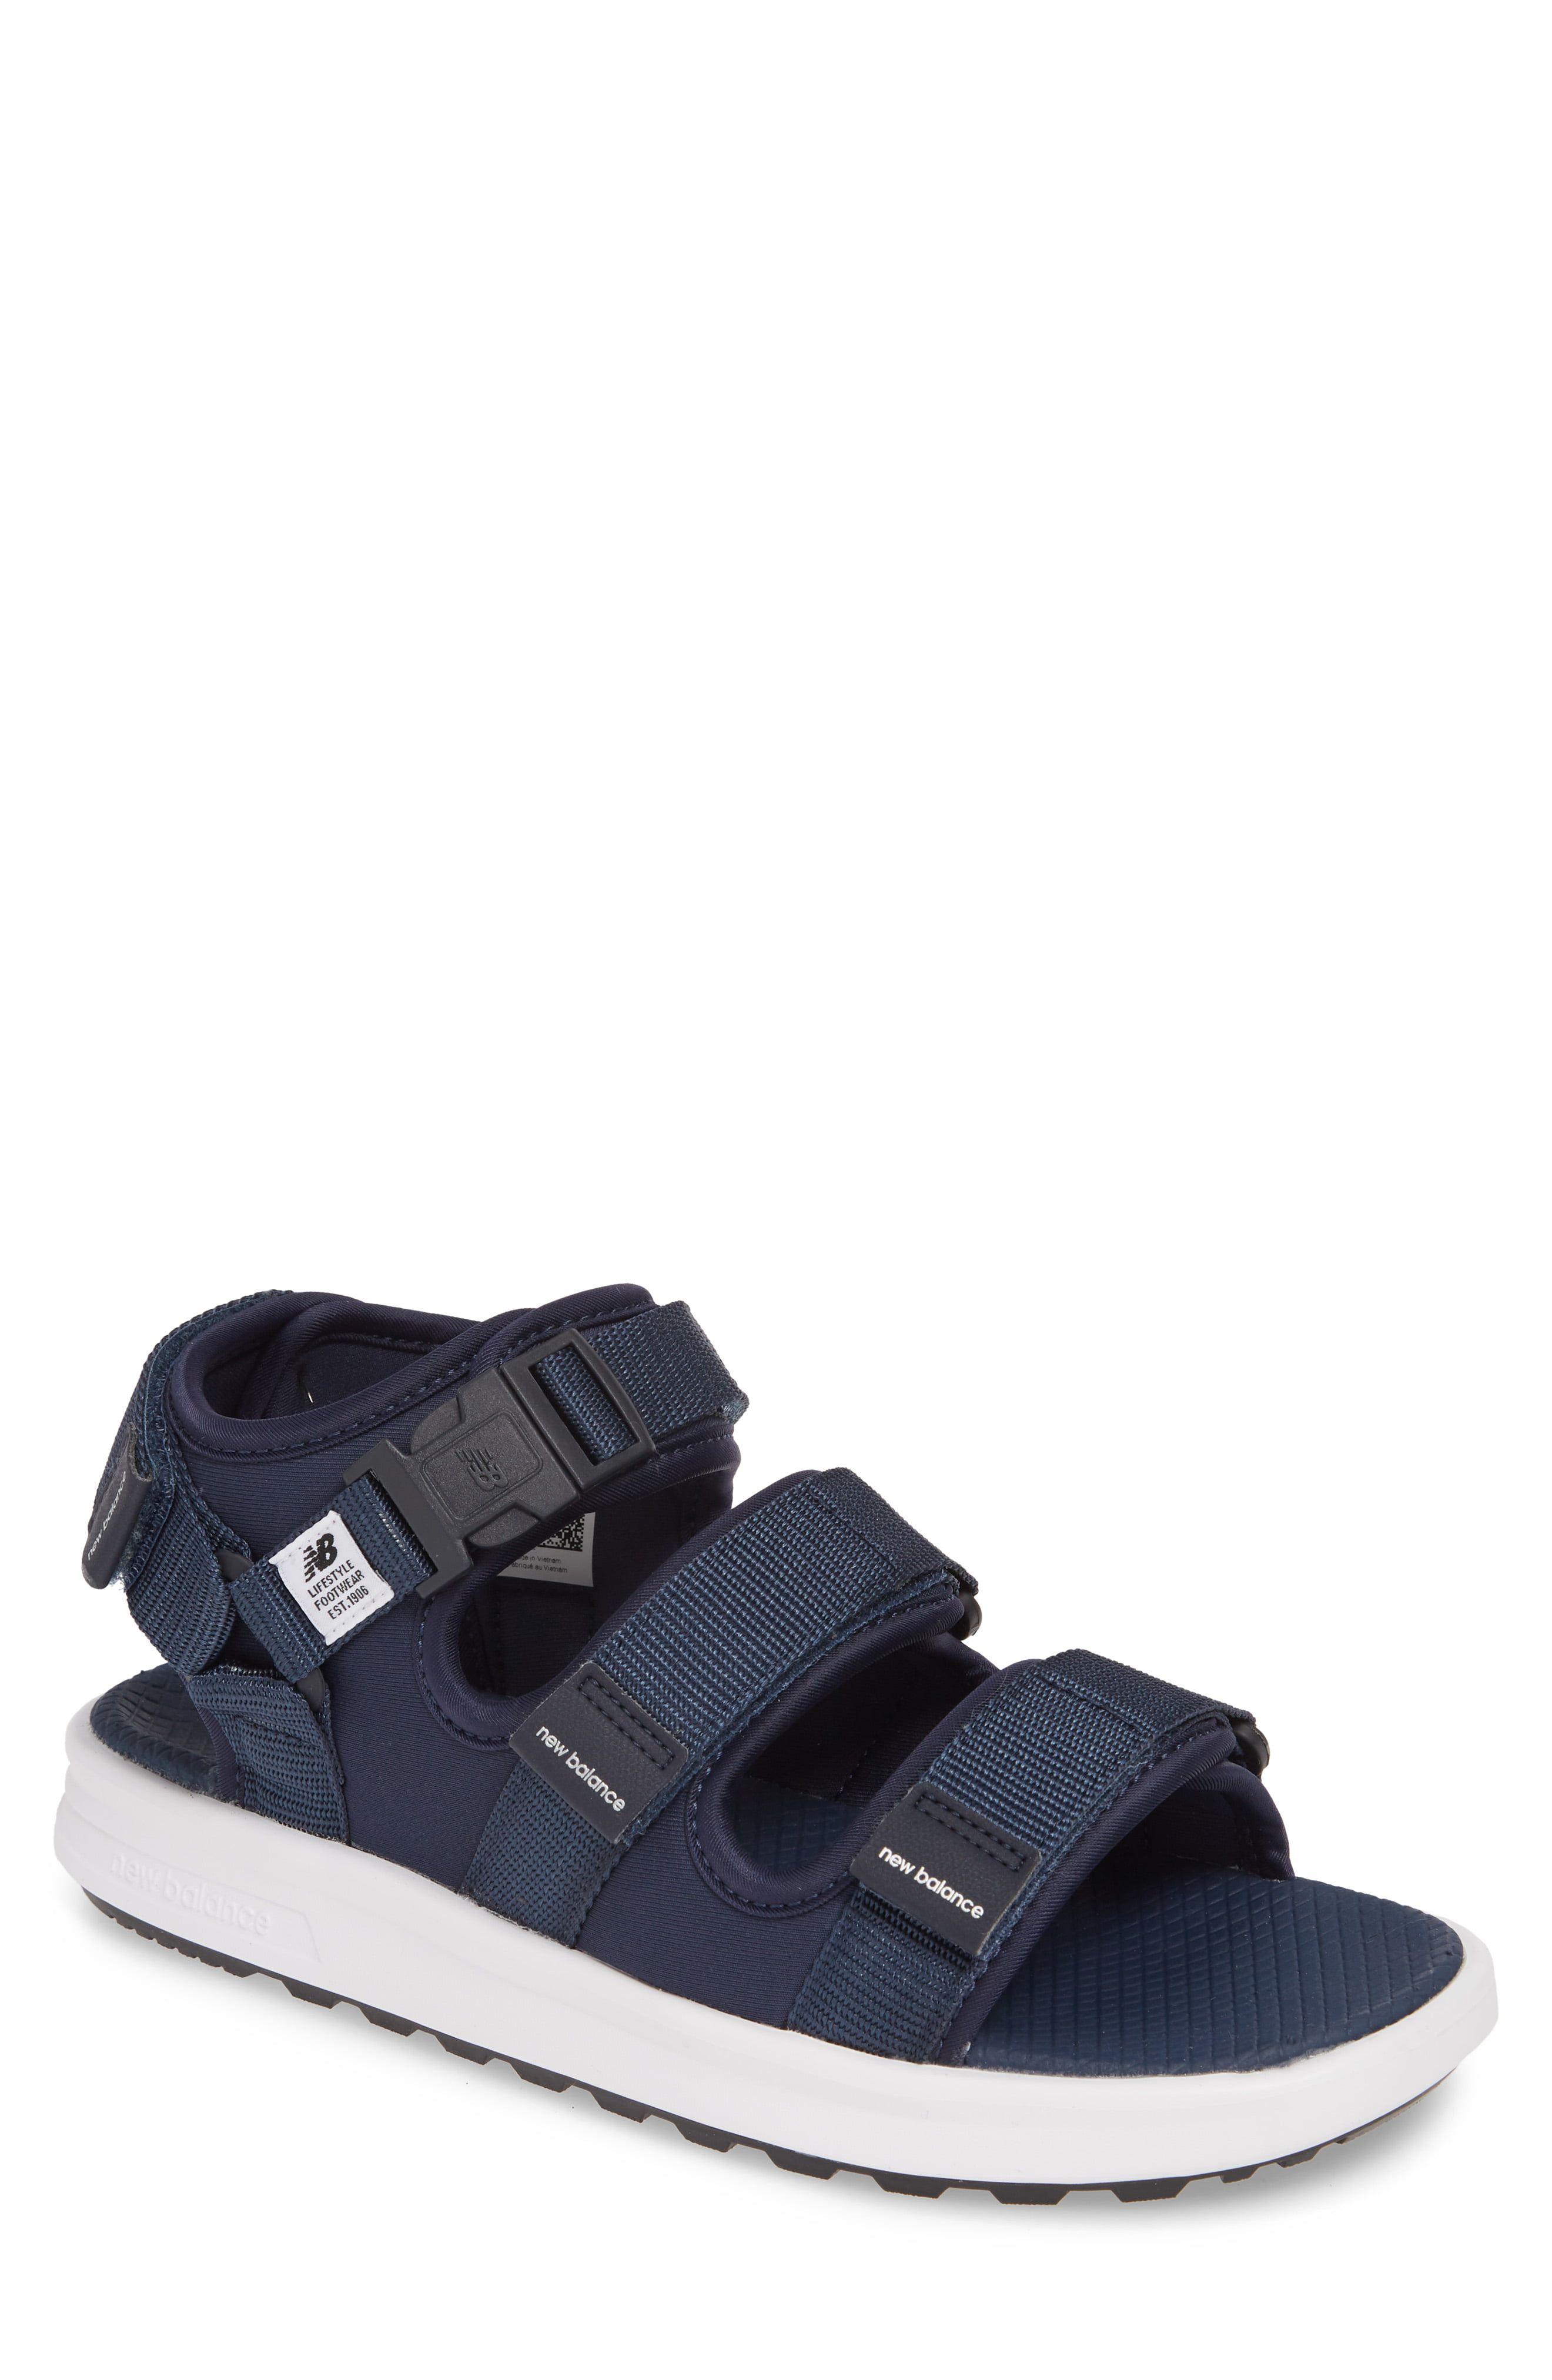 New Balance 750 Water Sandal (Men) | Nordstrom | New balance ...